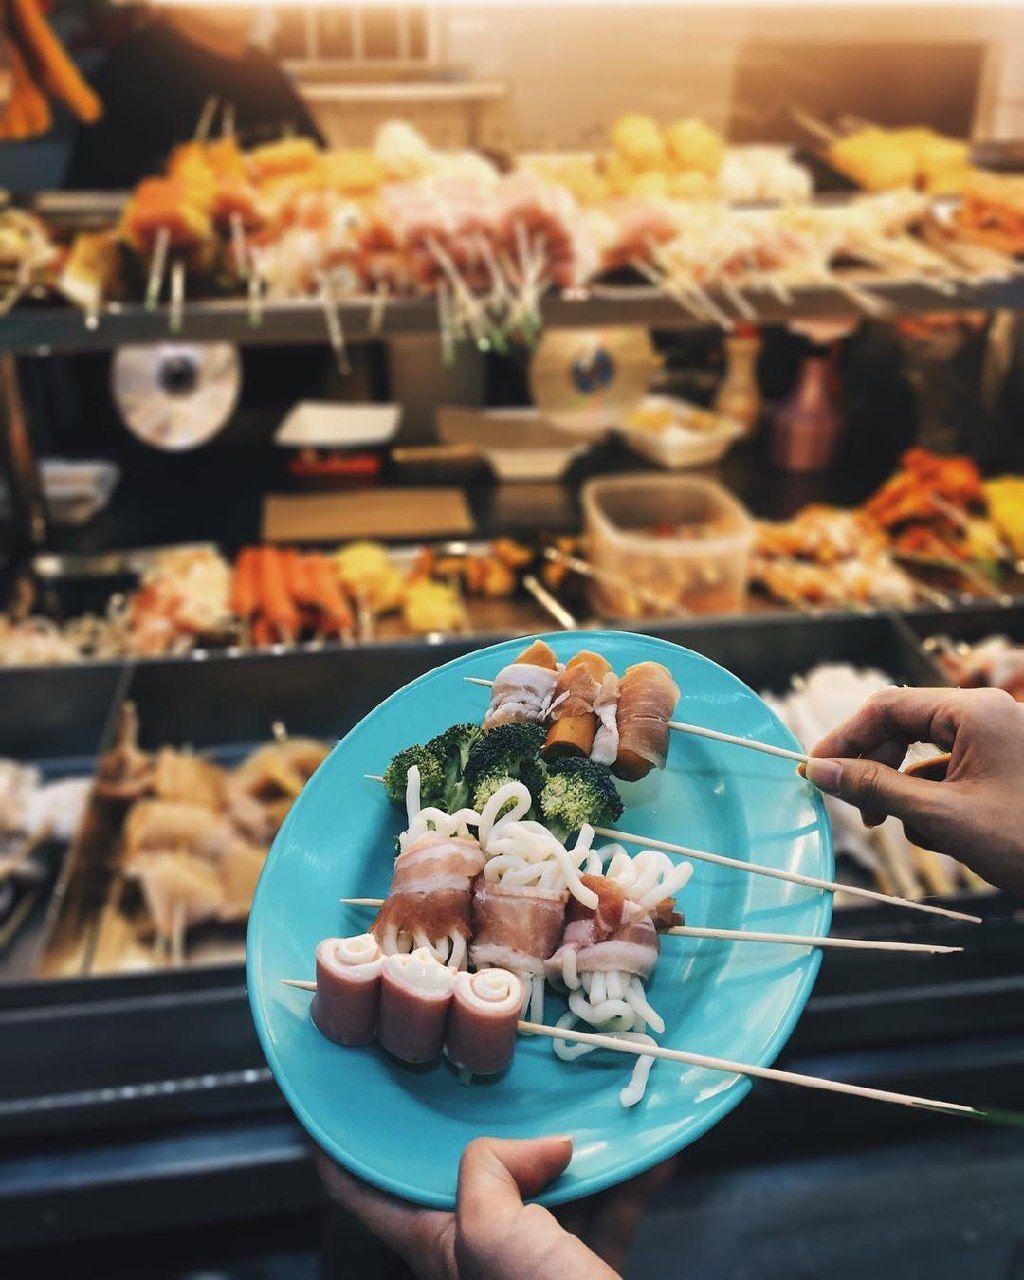 chomp chomp food centre-wang bbq and grill lok lok